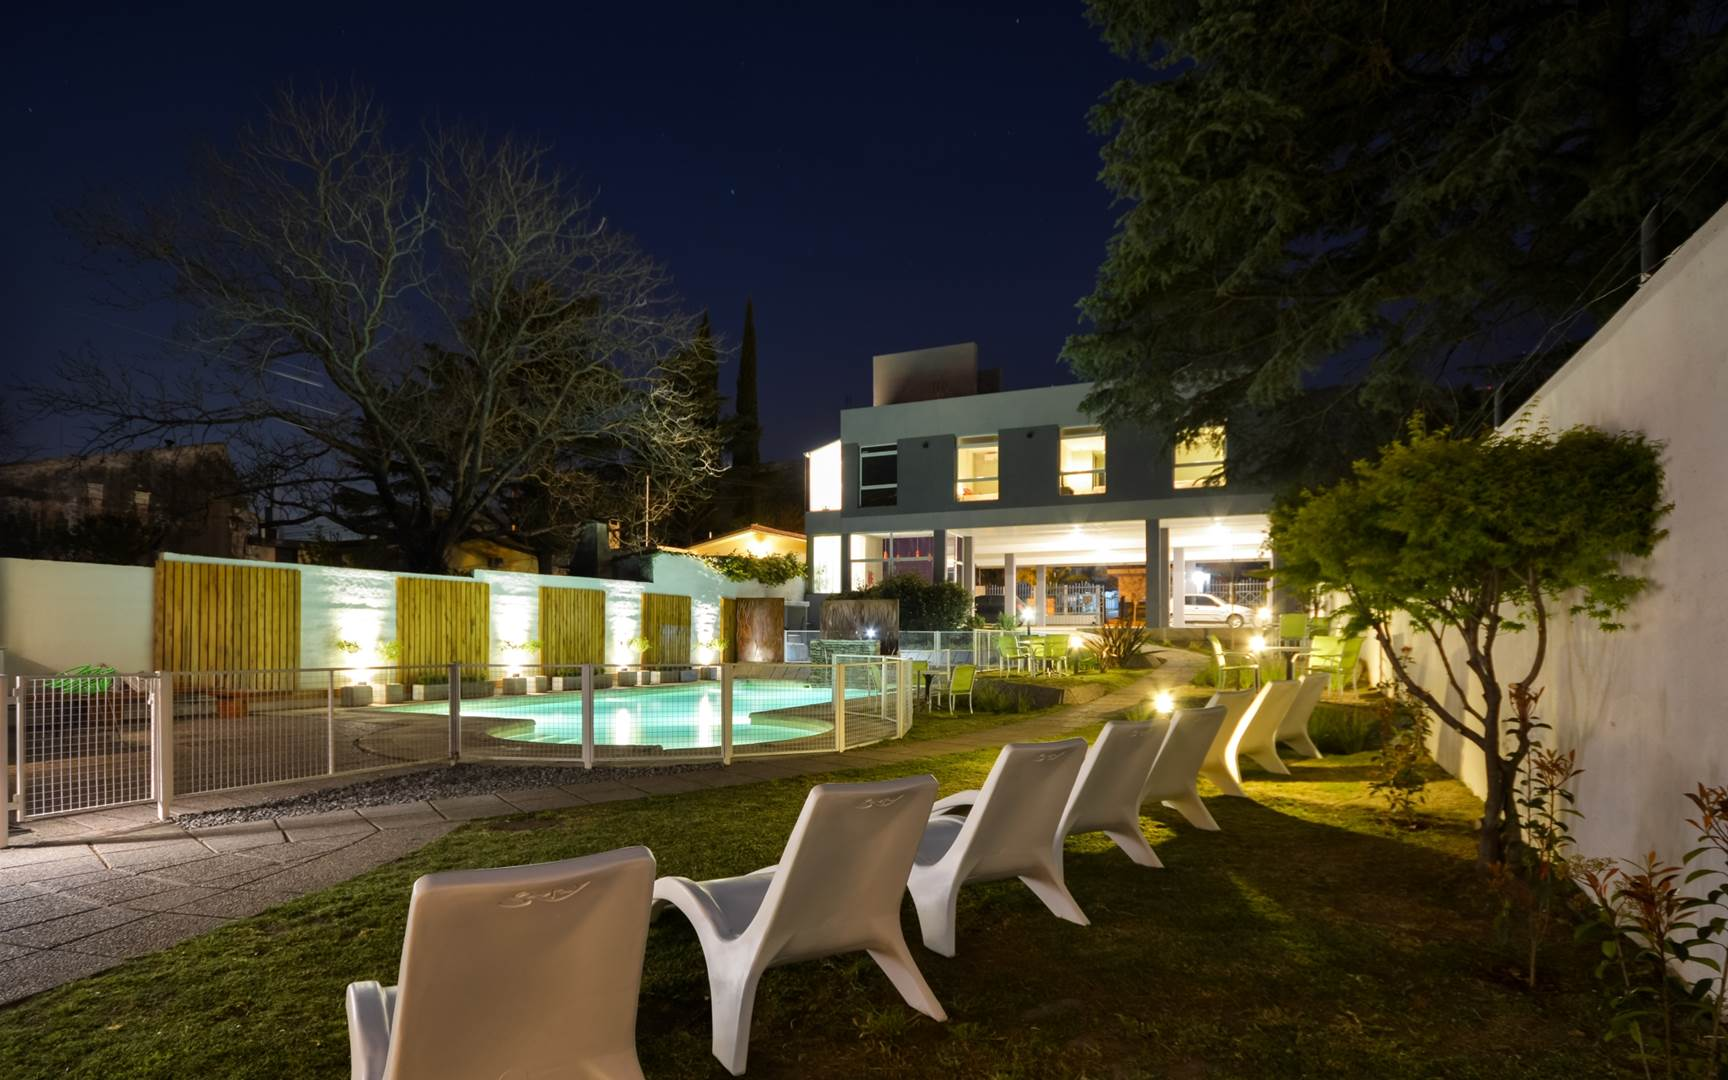 100917  -  HOTEL ALPRE ph1 G Viramonte-2134 (Copy)